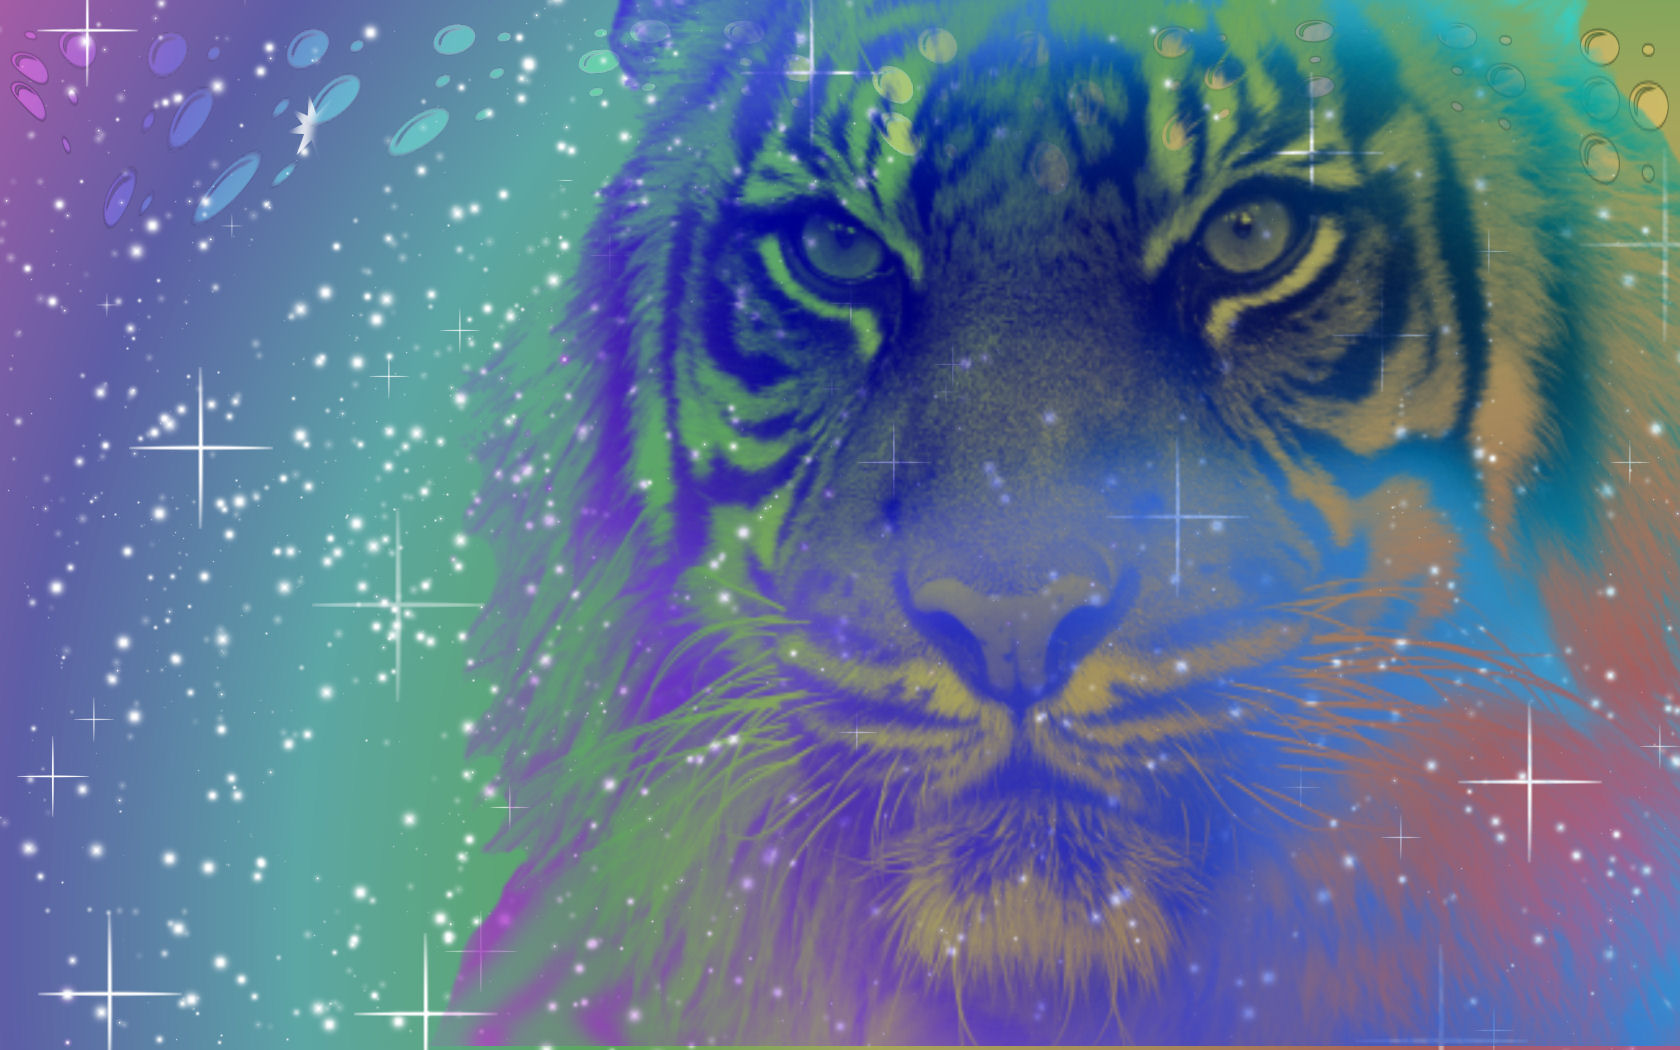 Sookie Tiger Wallpaper By Sookiesooker On Deviantart